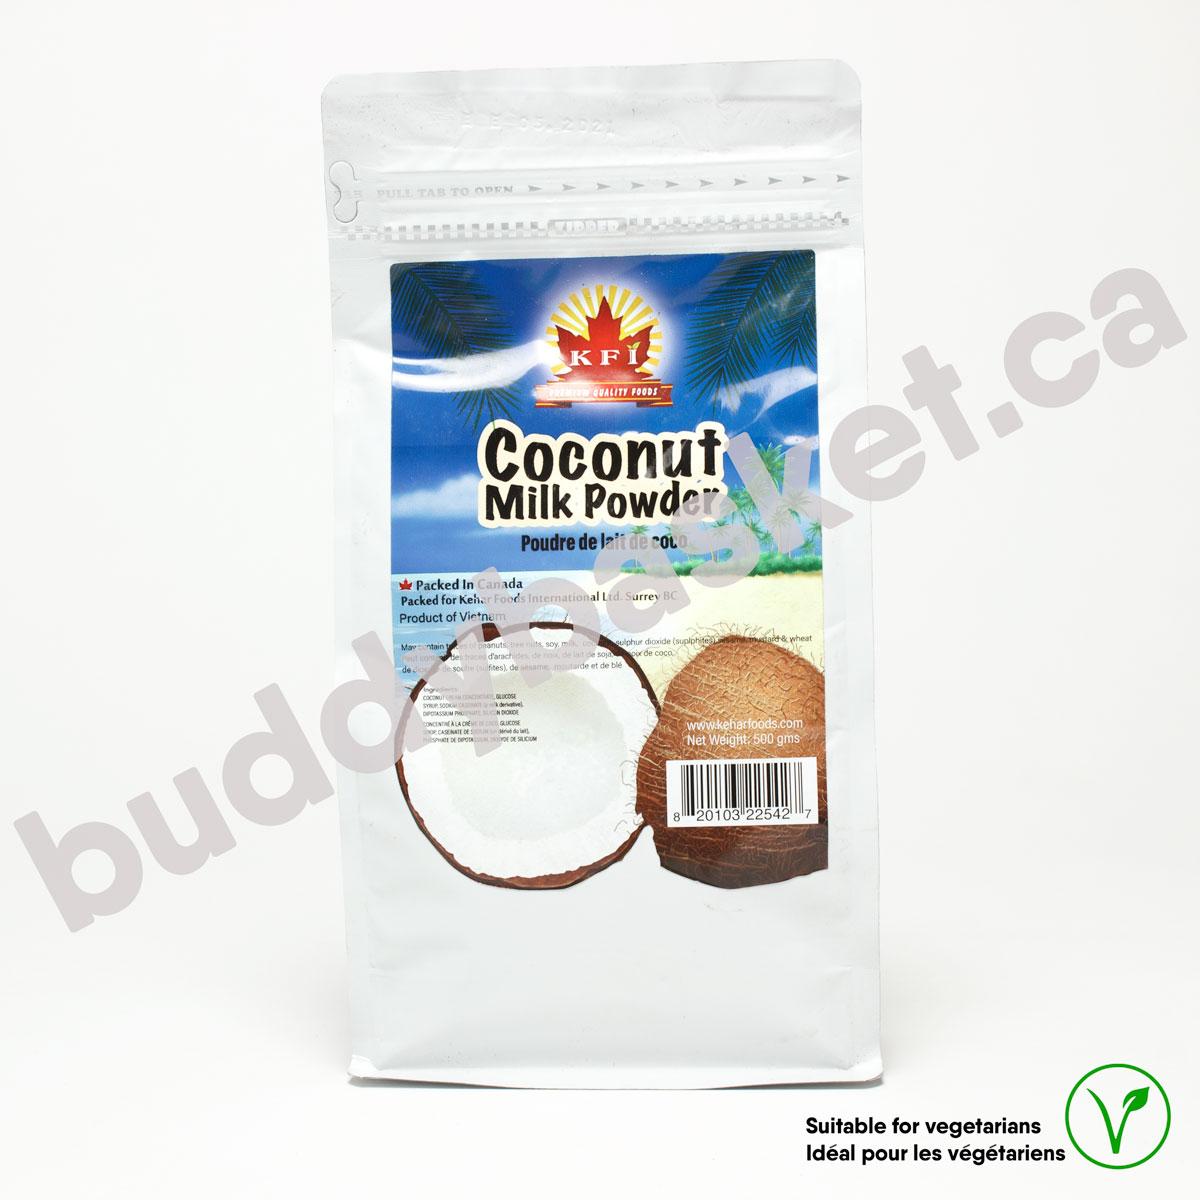 KFI Coconut MIlk Powder 500g